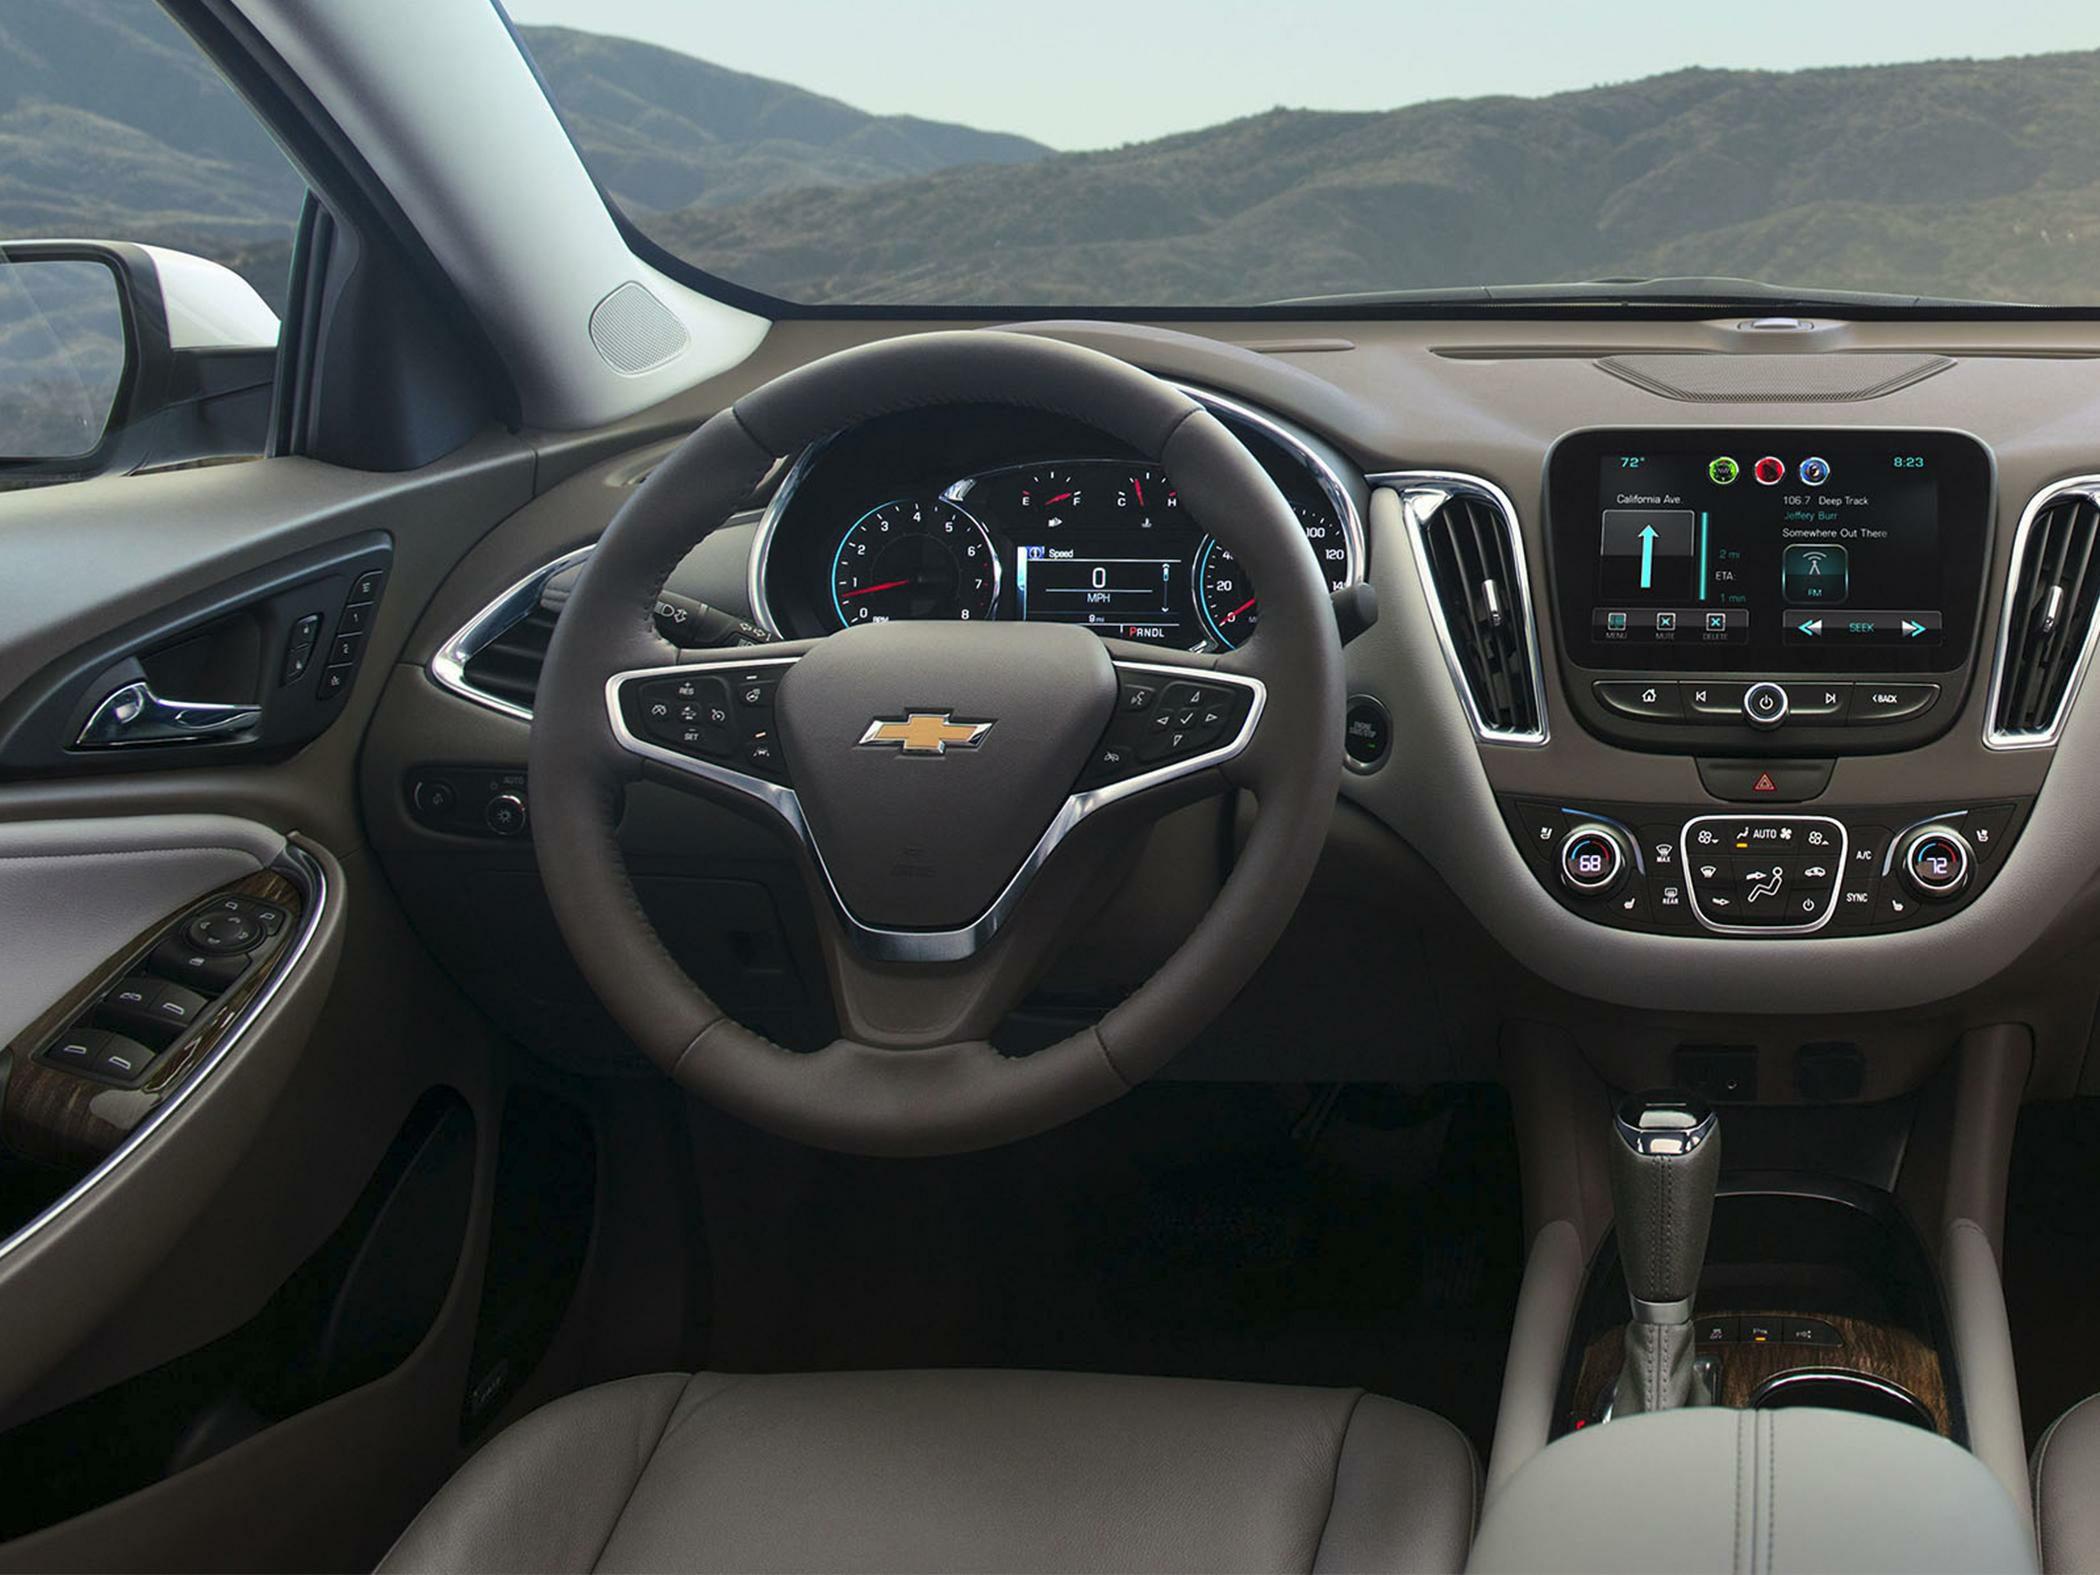 2018 Chevrolet Malibu Hybrid Pictures & Photos - CarsDirect